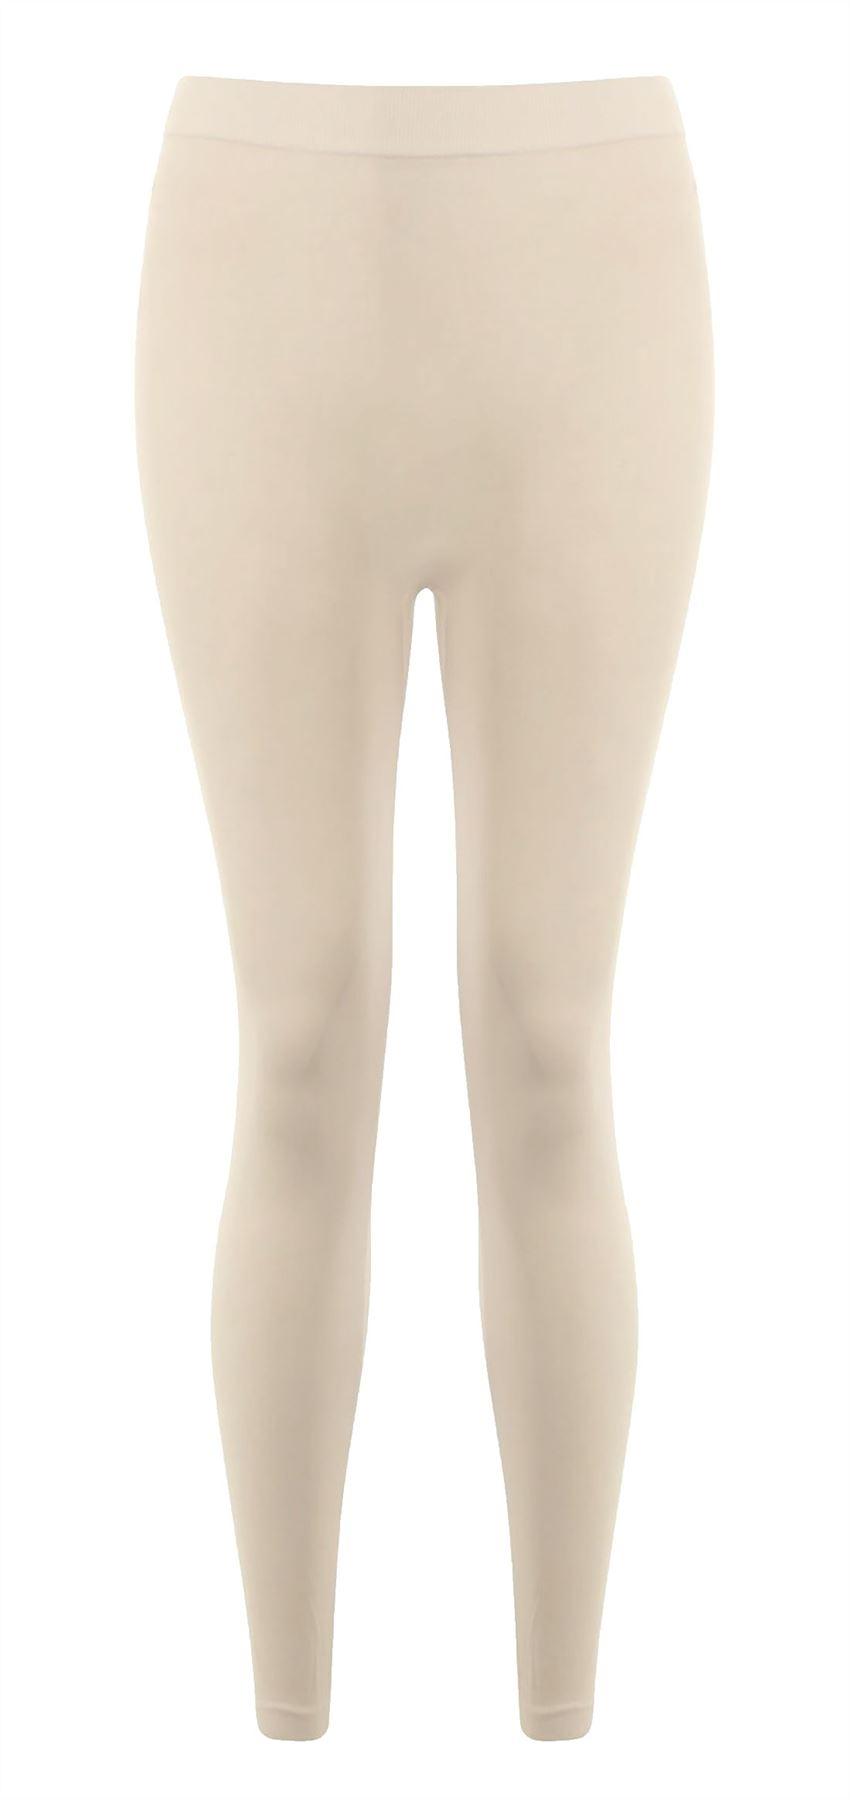 Ladies Viscose Plain Full Length Leggings Womens Elastic Waist Casual Gym Pants